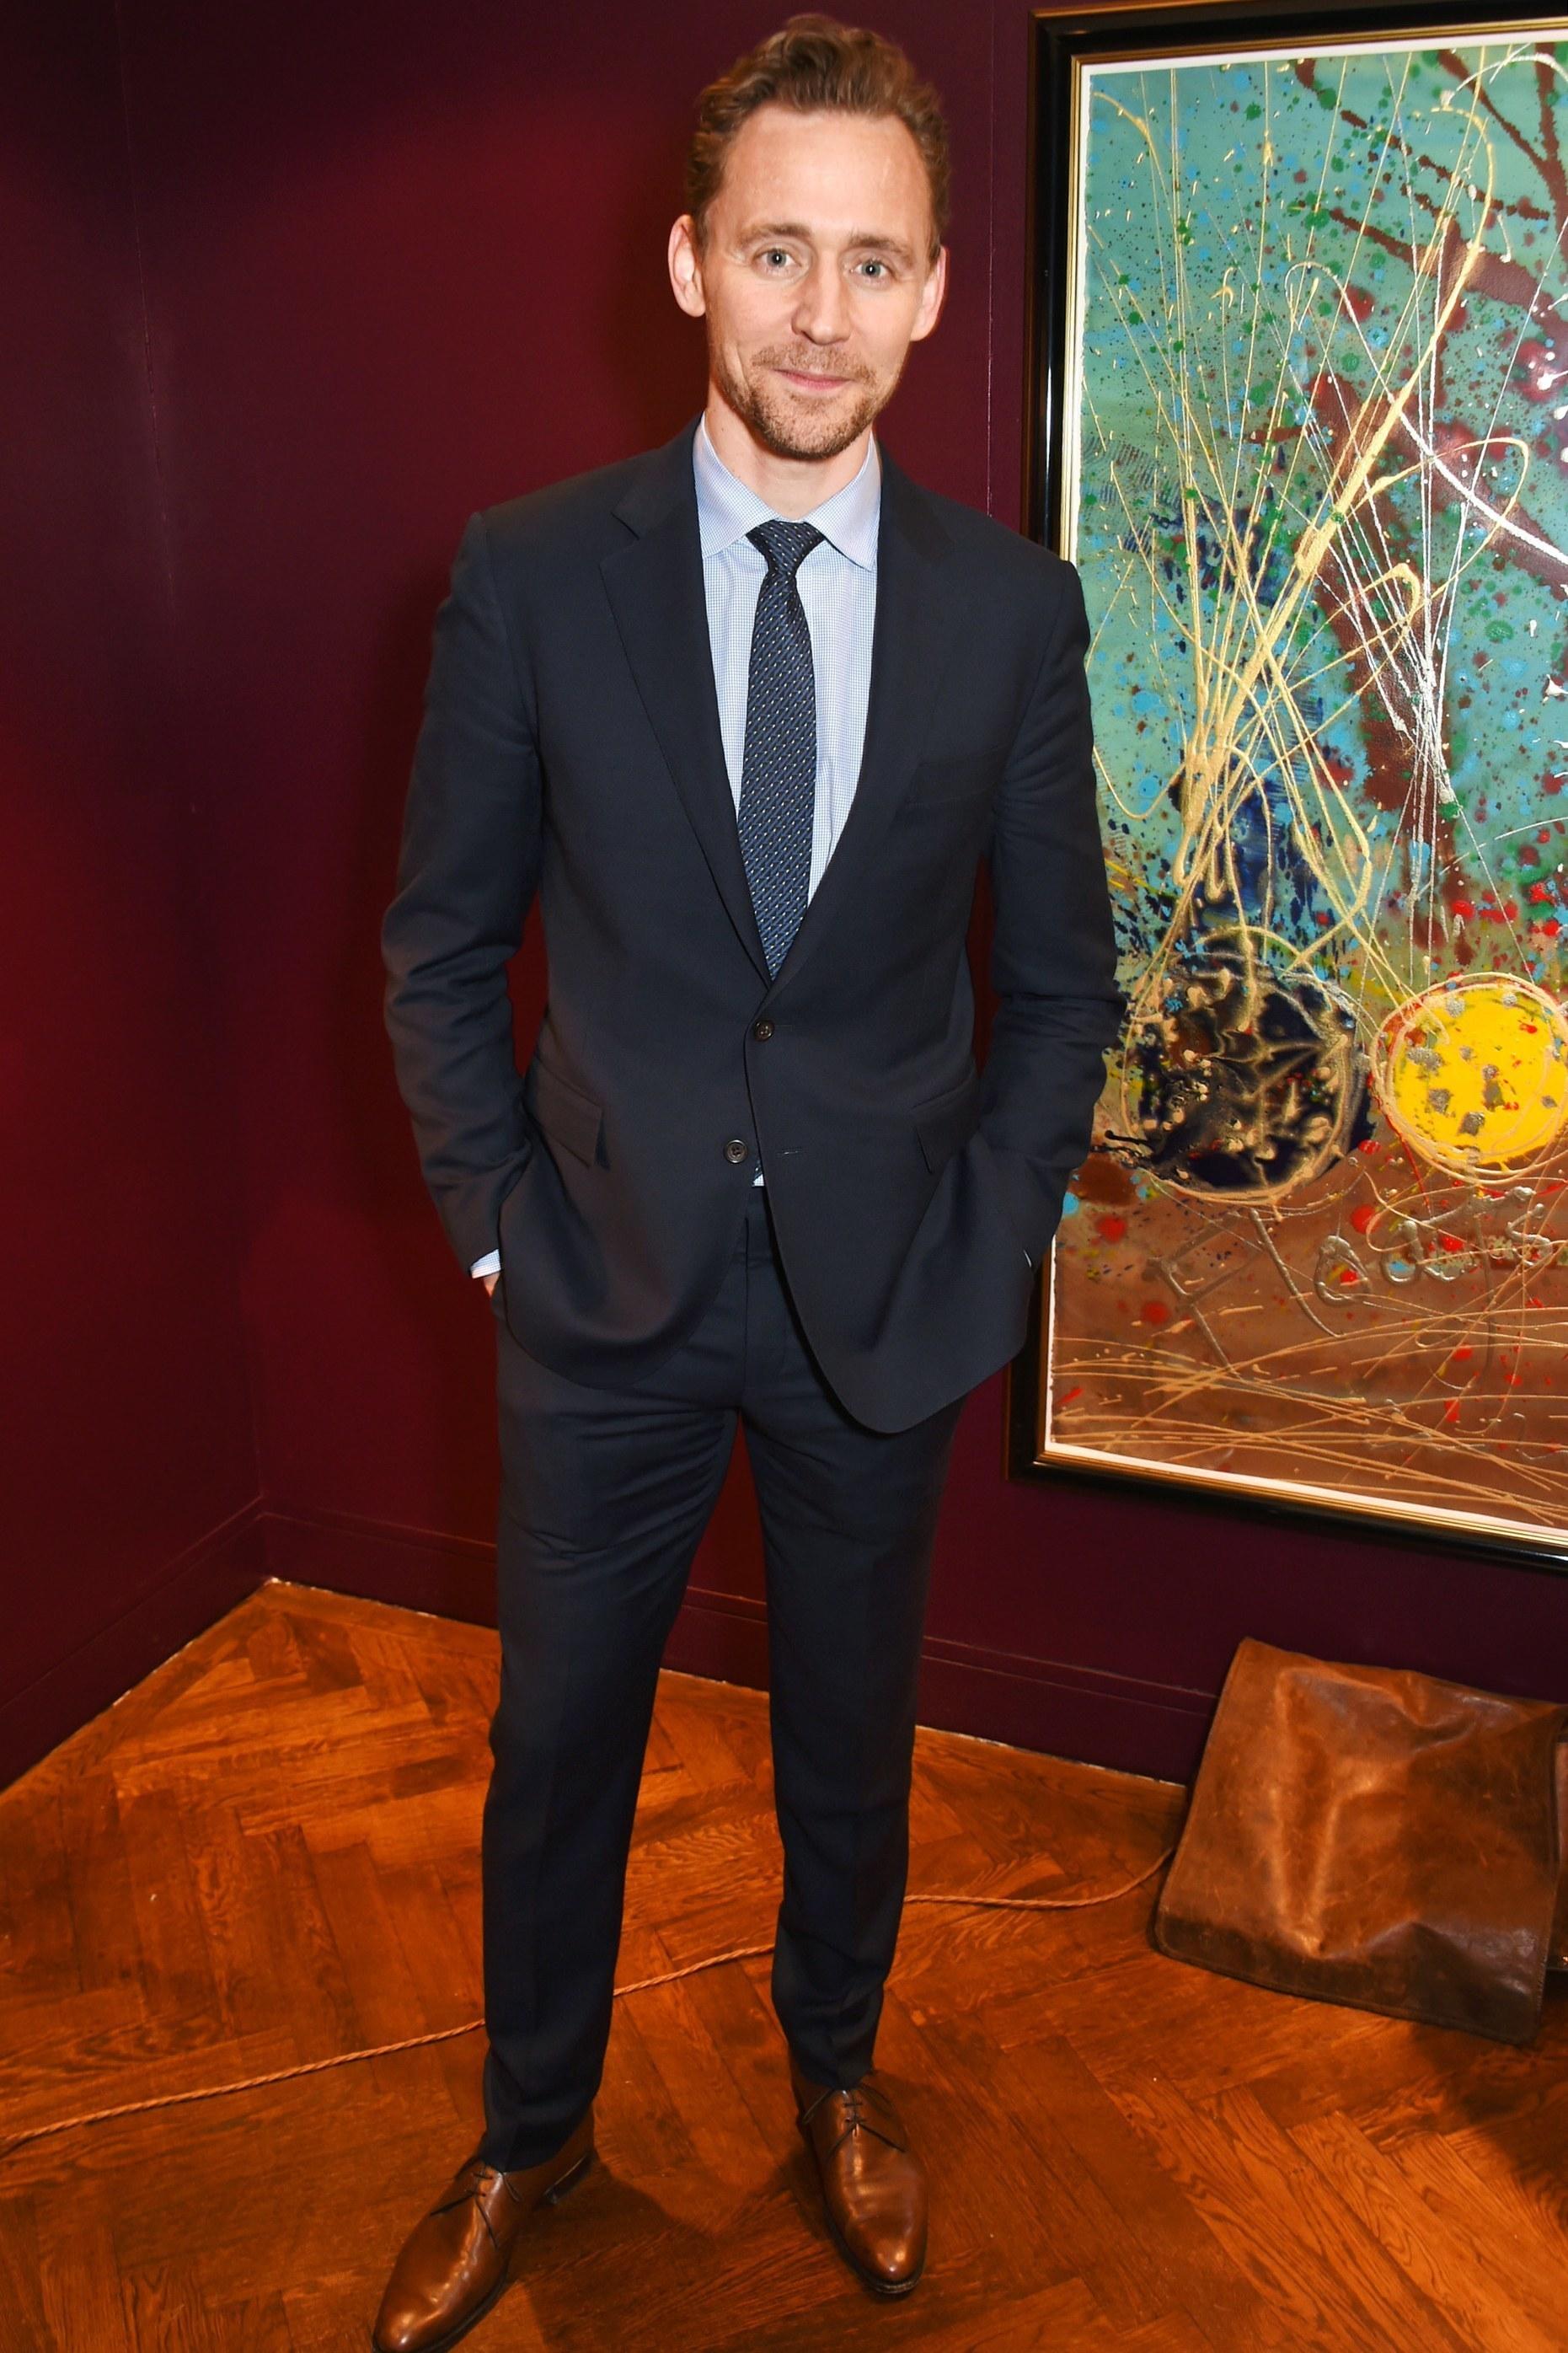 Tom Hiddleston wearing Black Suit, Light Blue Vertical Striped ...